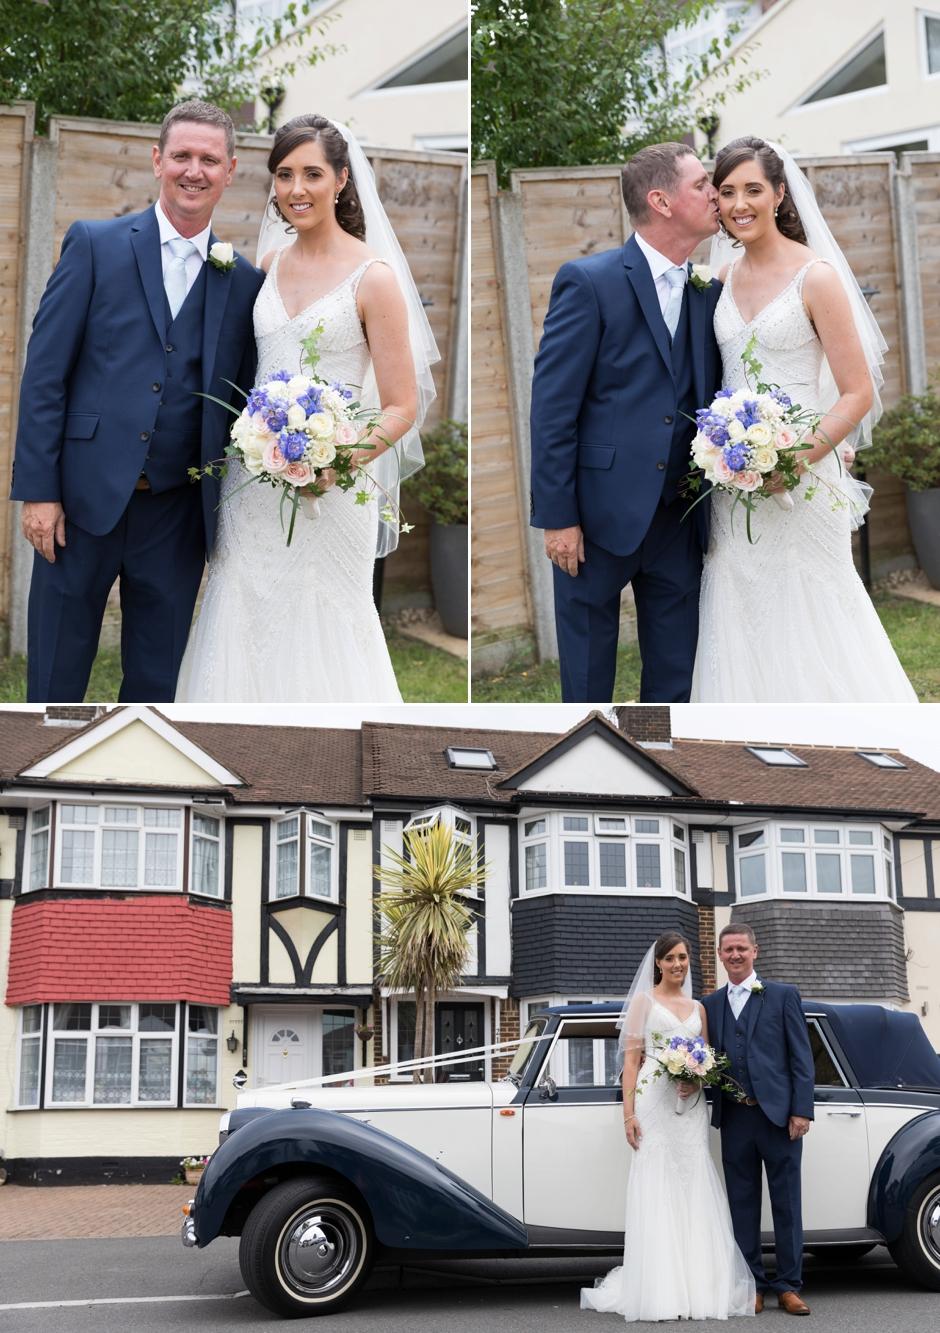 13-pembroke-lodge-richmond-park-london-wedding-photography-bride-getting-ready